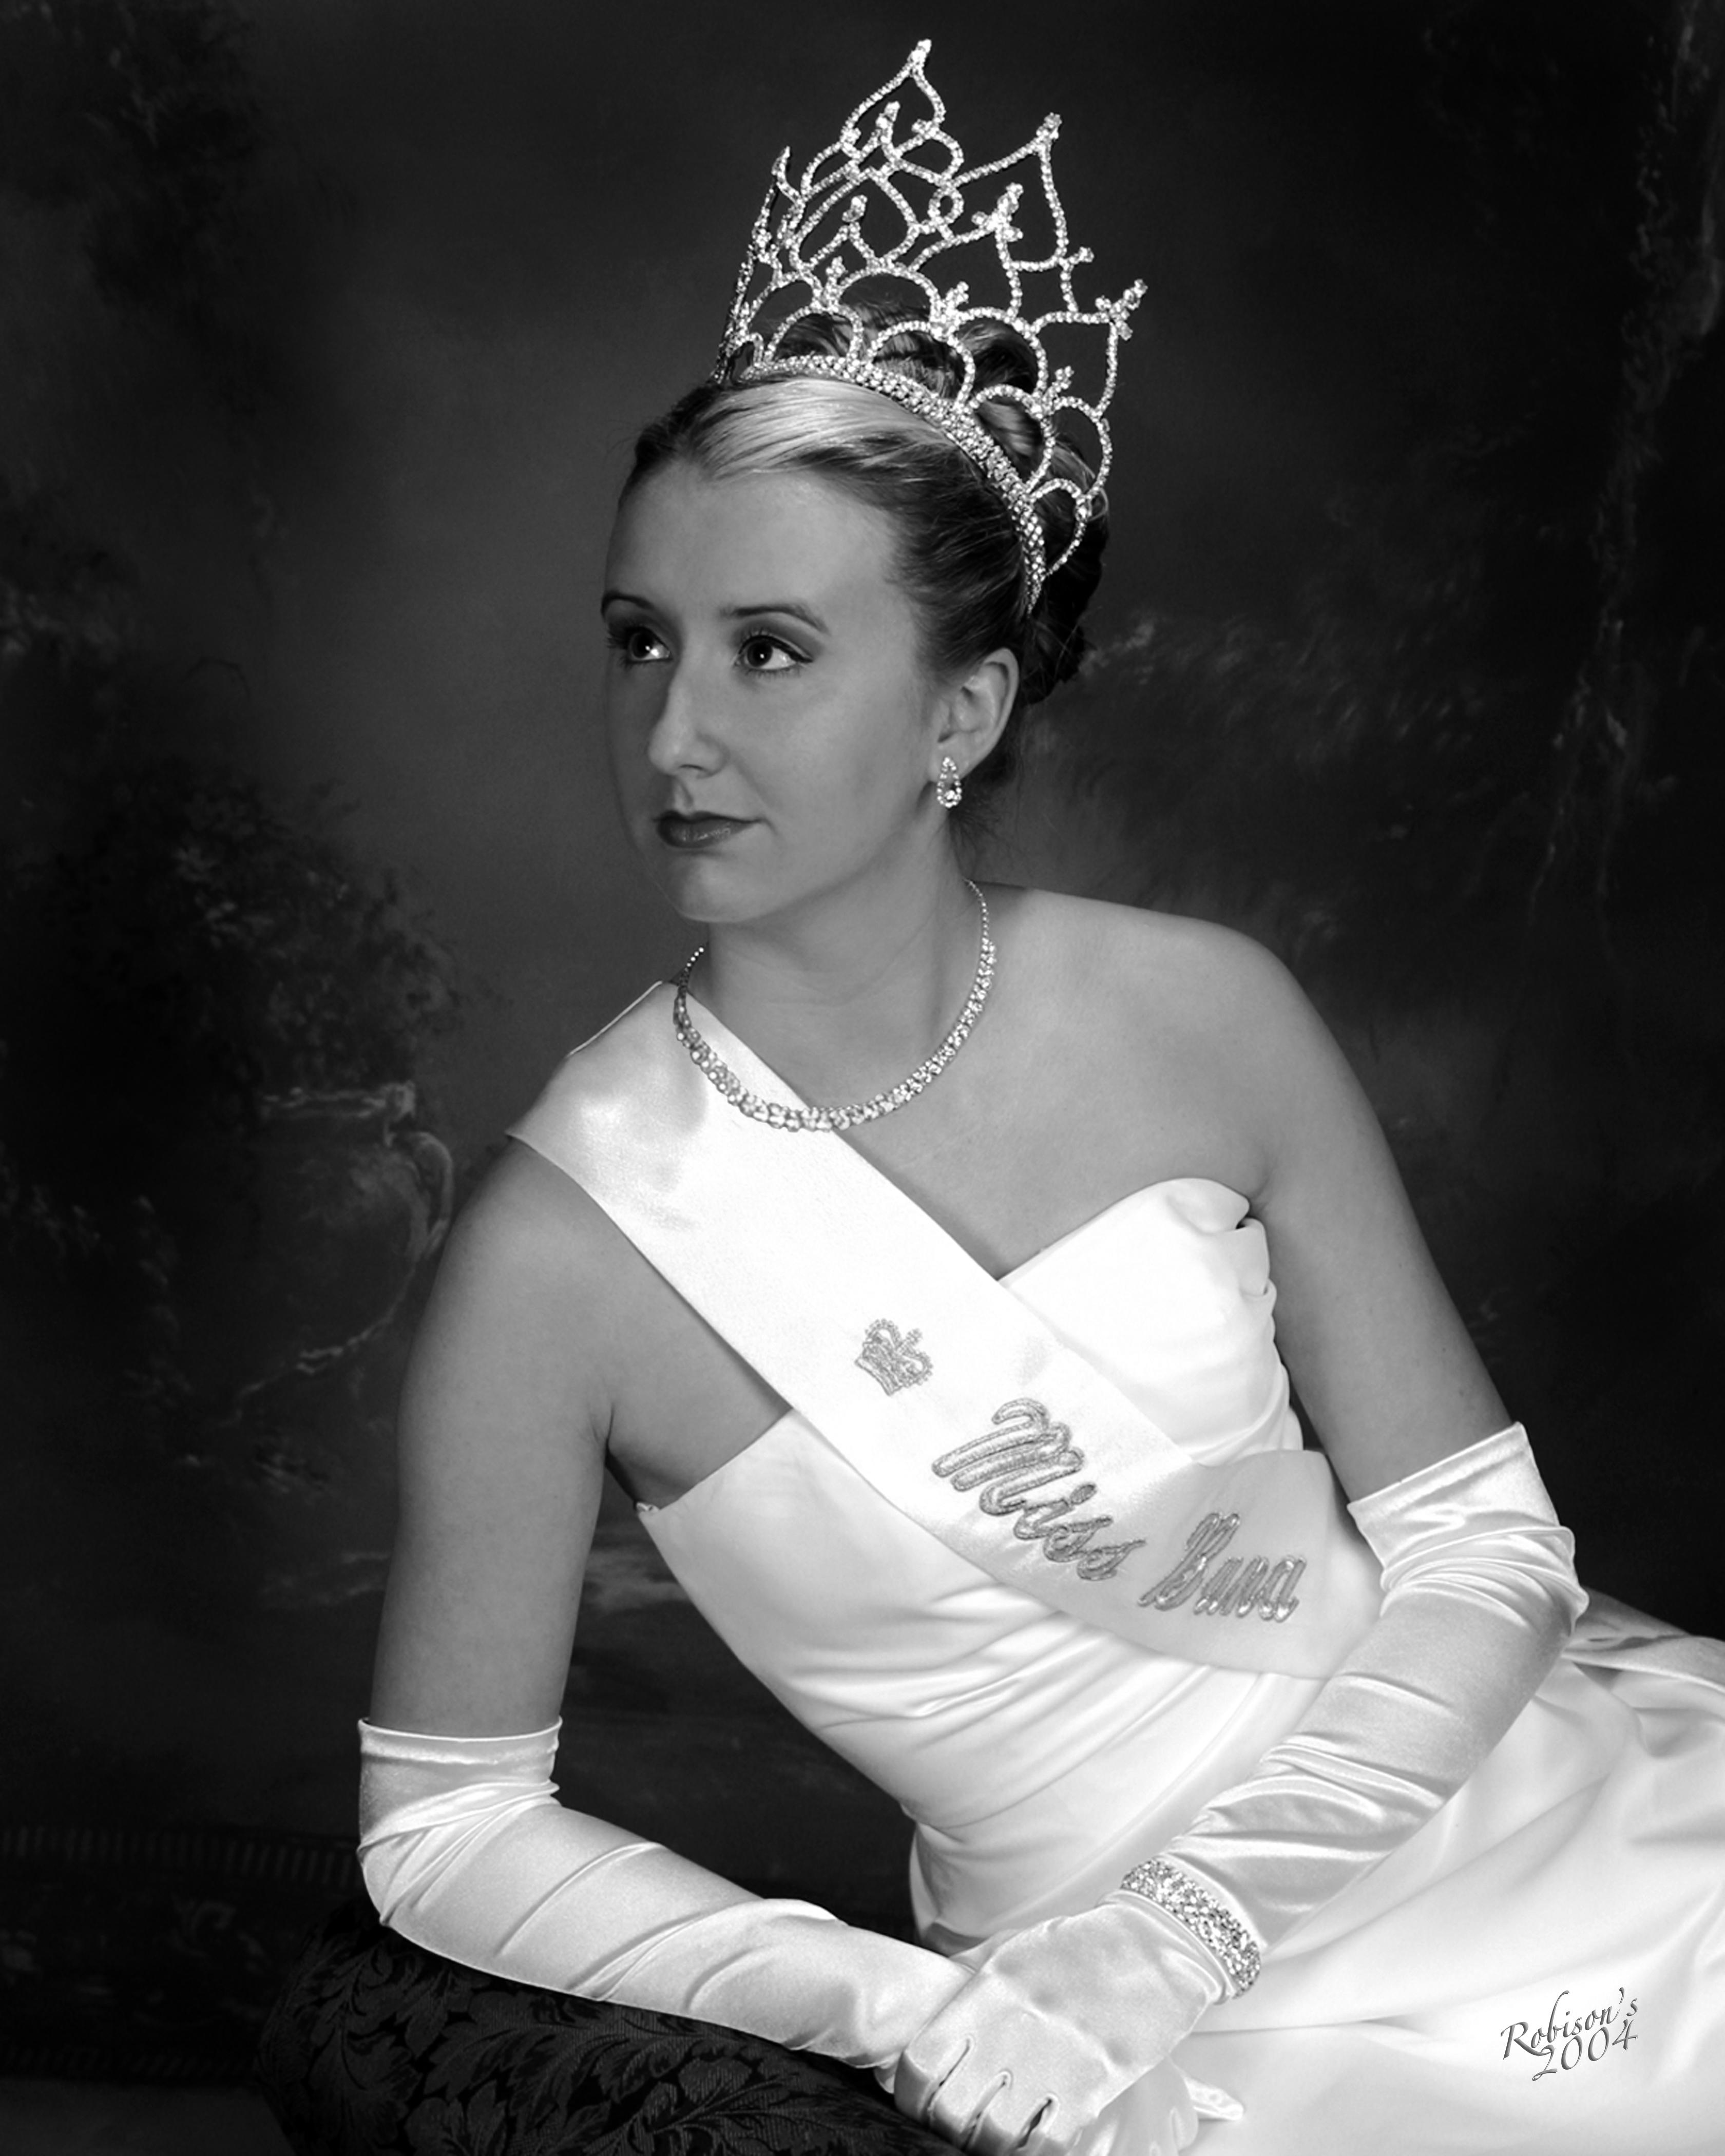 Kate Boudreaux Strawther - Miss Buna 2003